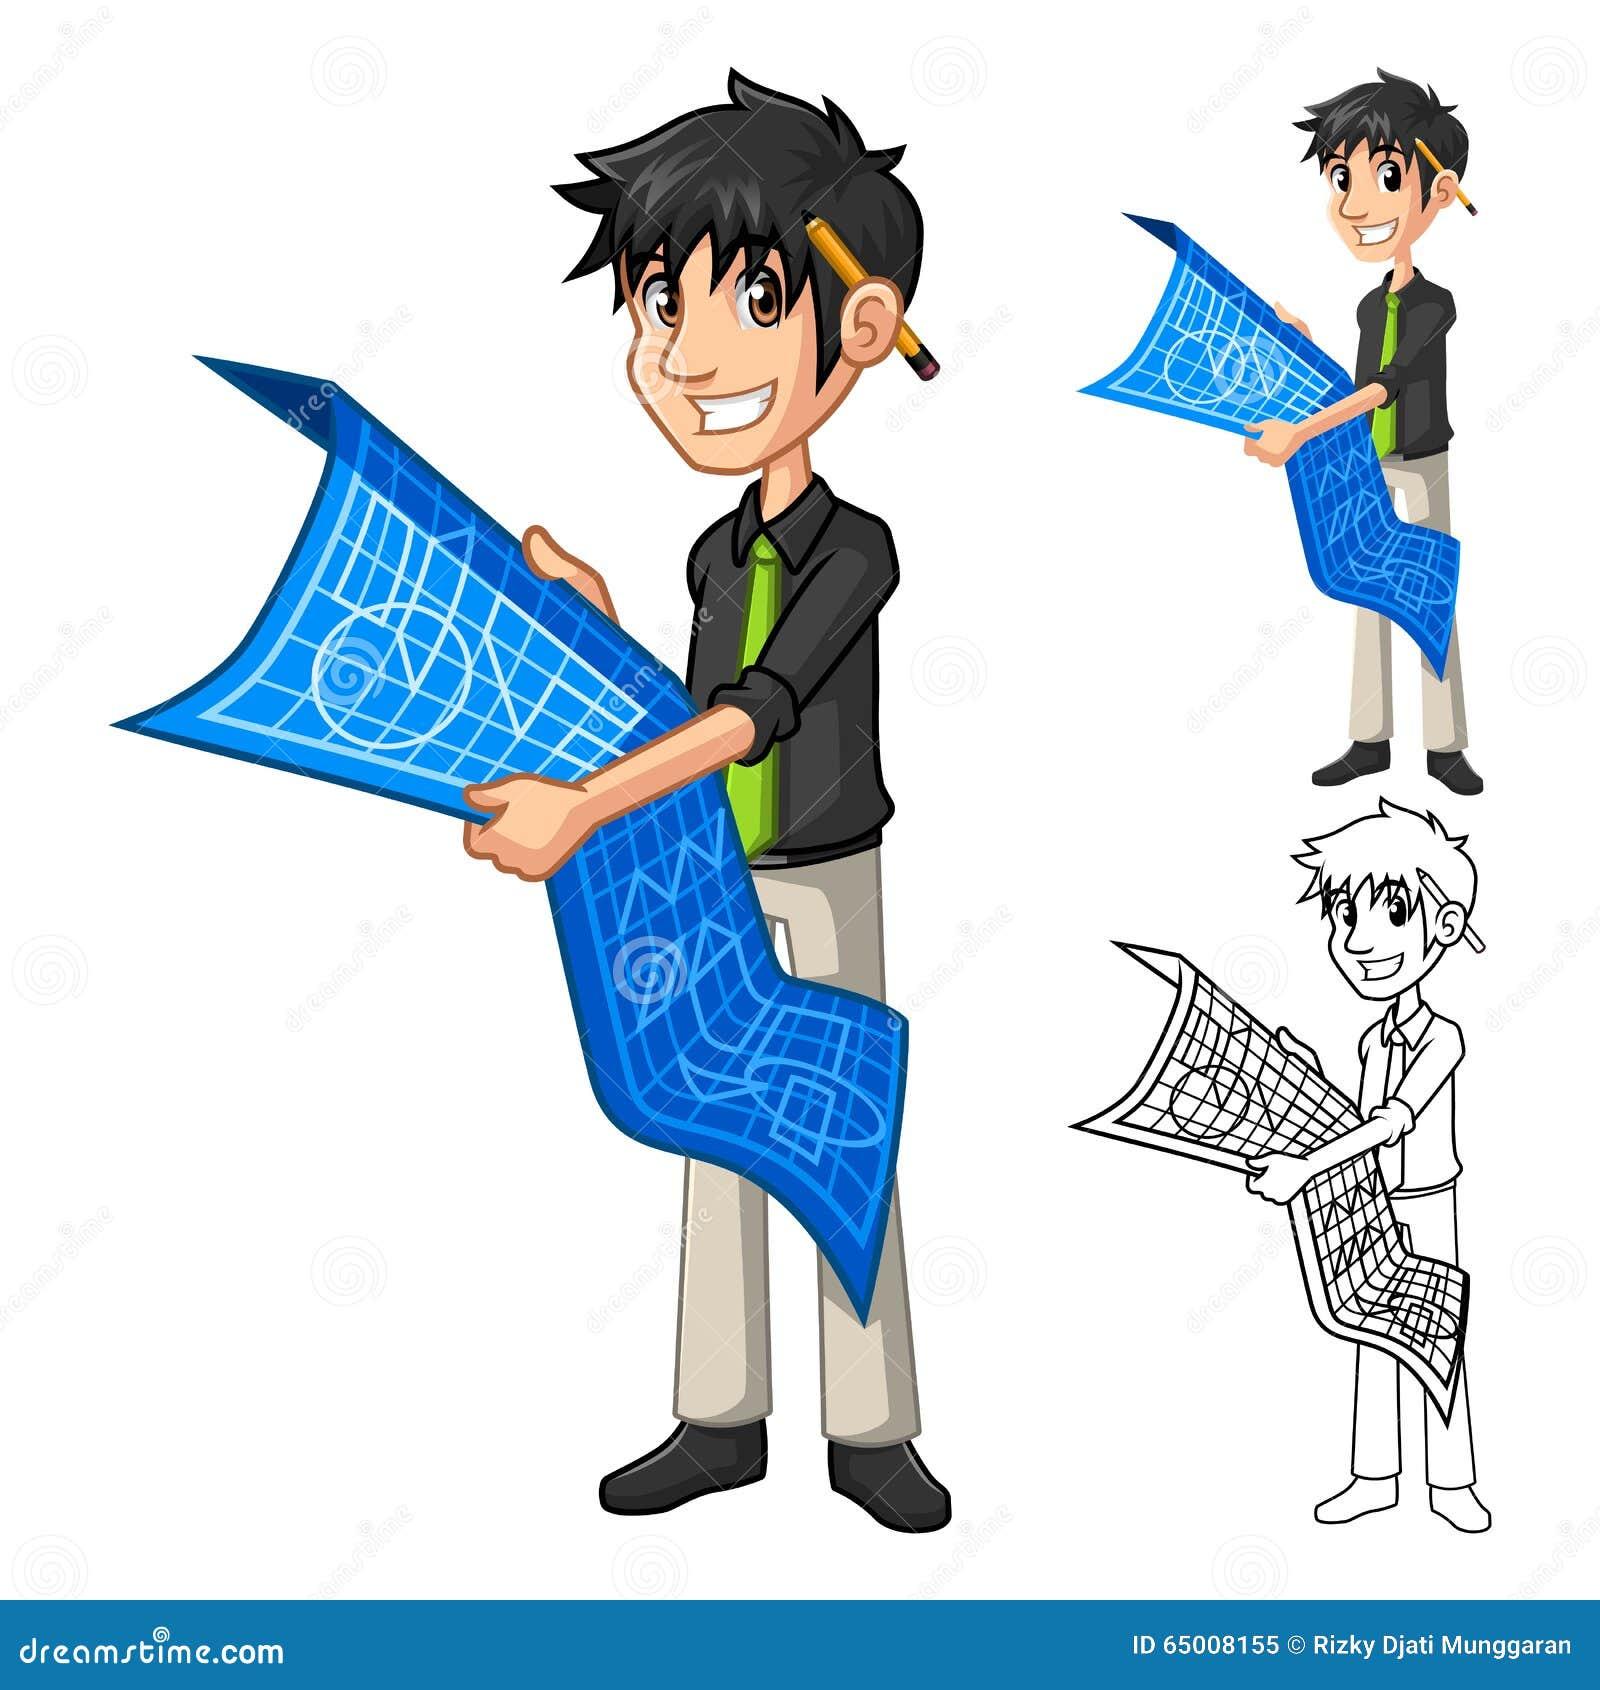 personaje de dibujos animados del plan del mapa de holding blue print del arquitecto del hombre. Black Bedroom Furniture Sets. Home Design Ideas